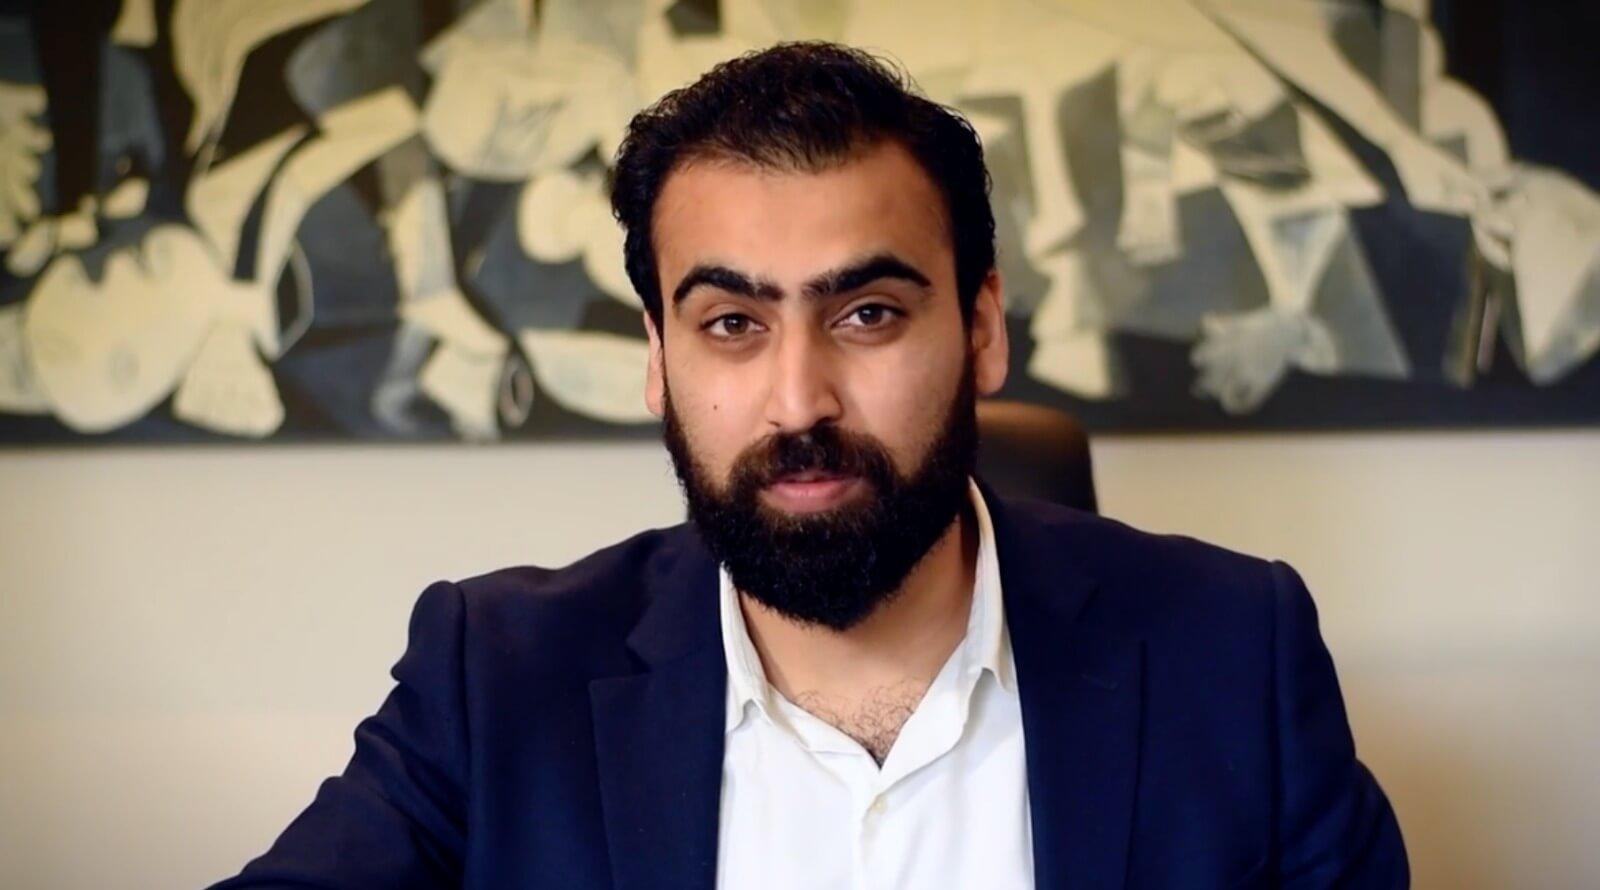 Owner of the shopify ecommerce shop export leftovers umar qamar